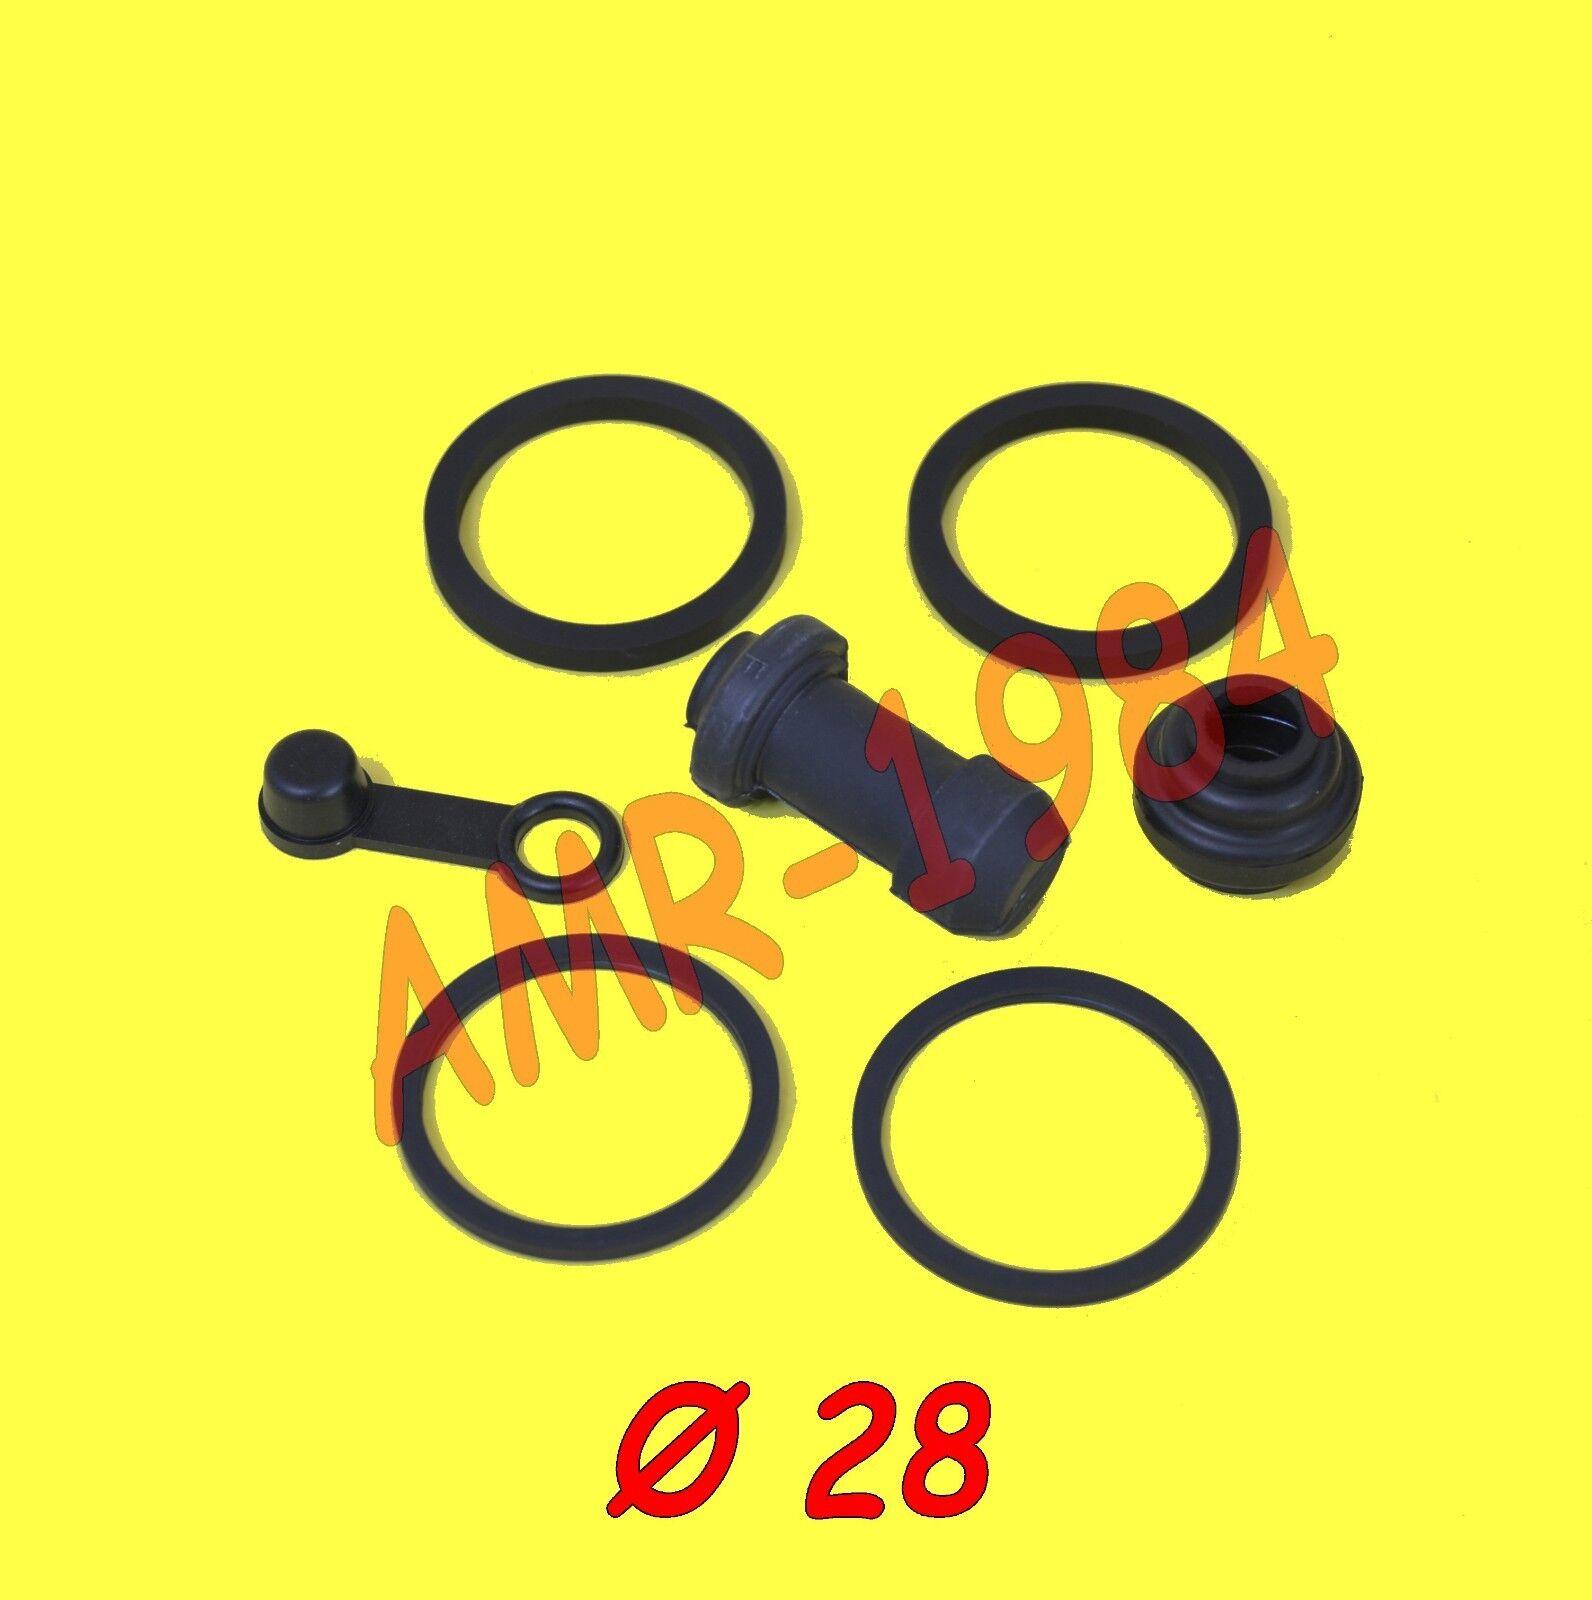 KIT REVISIONE PINZA FRENO ANTERIORE HONDA SH 125 / 150 - CR 125 R V839100121